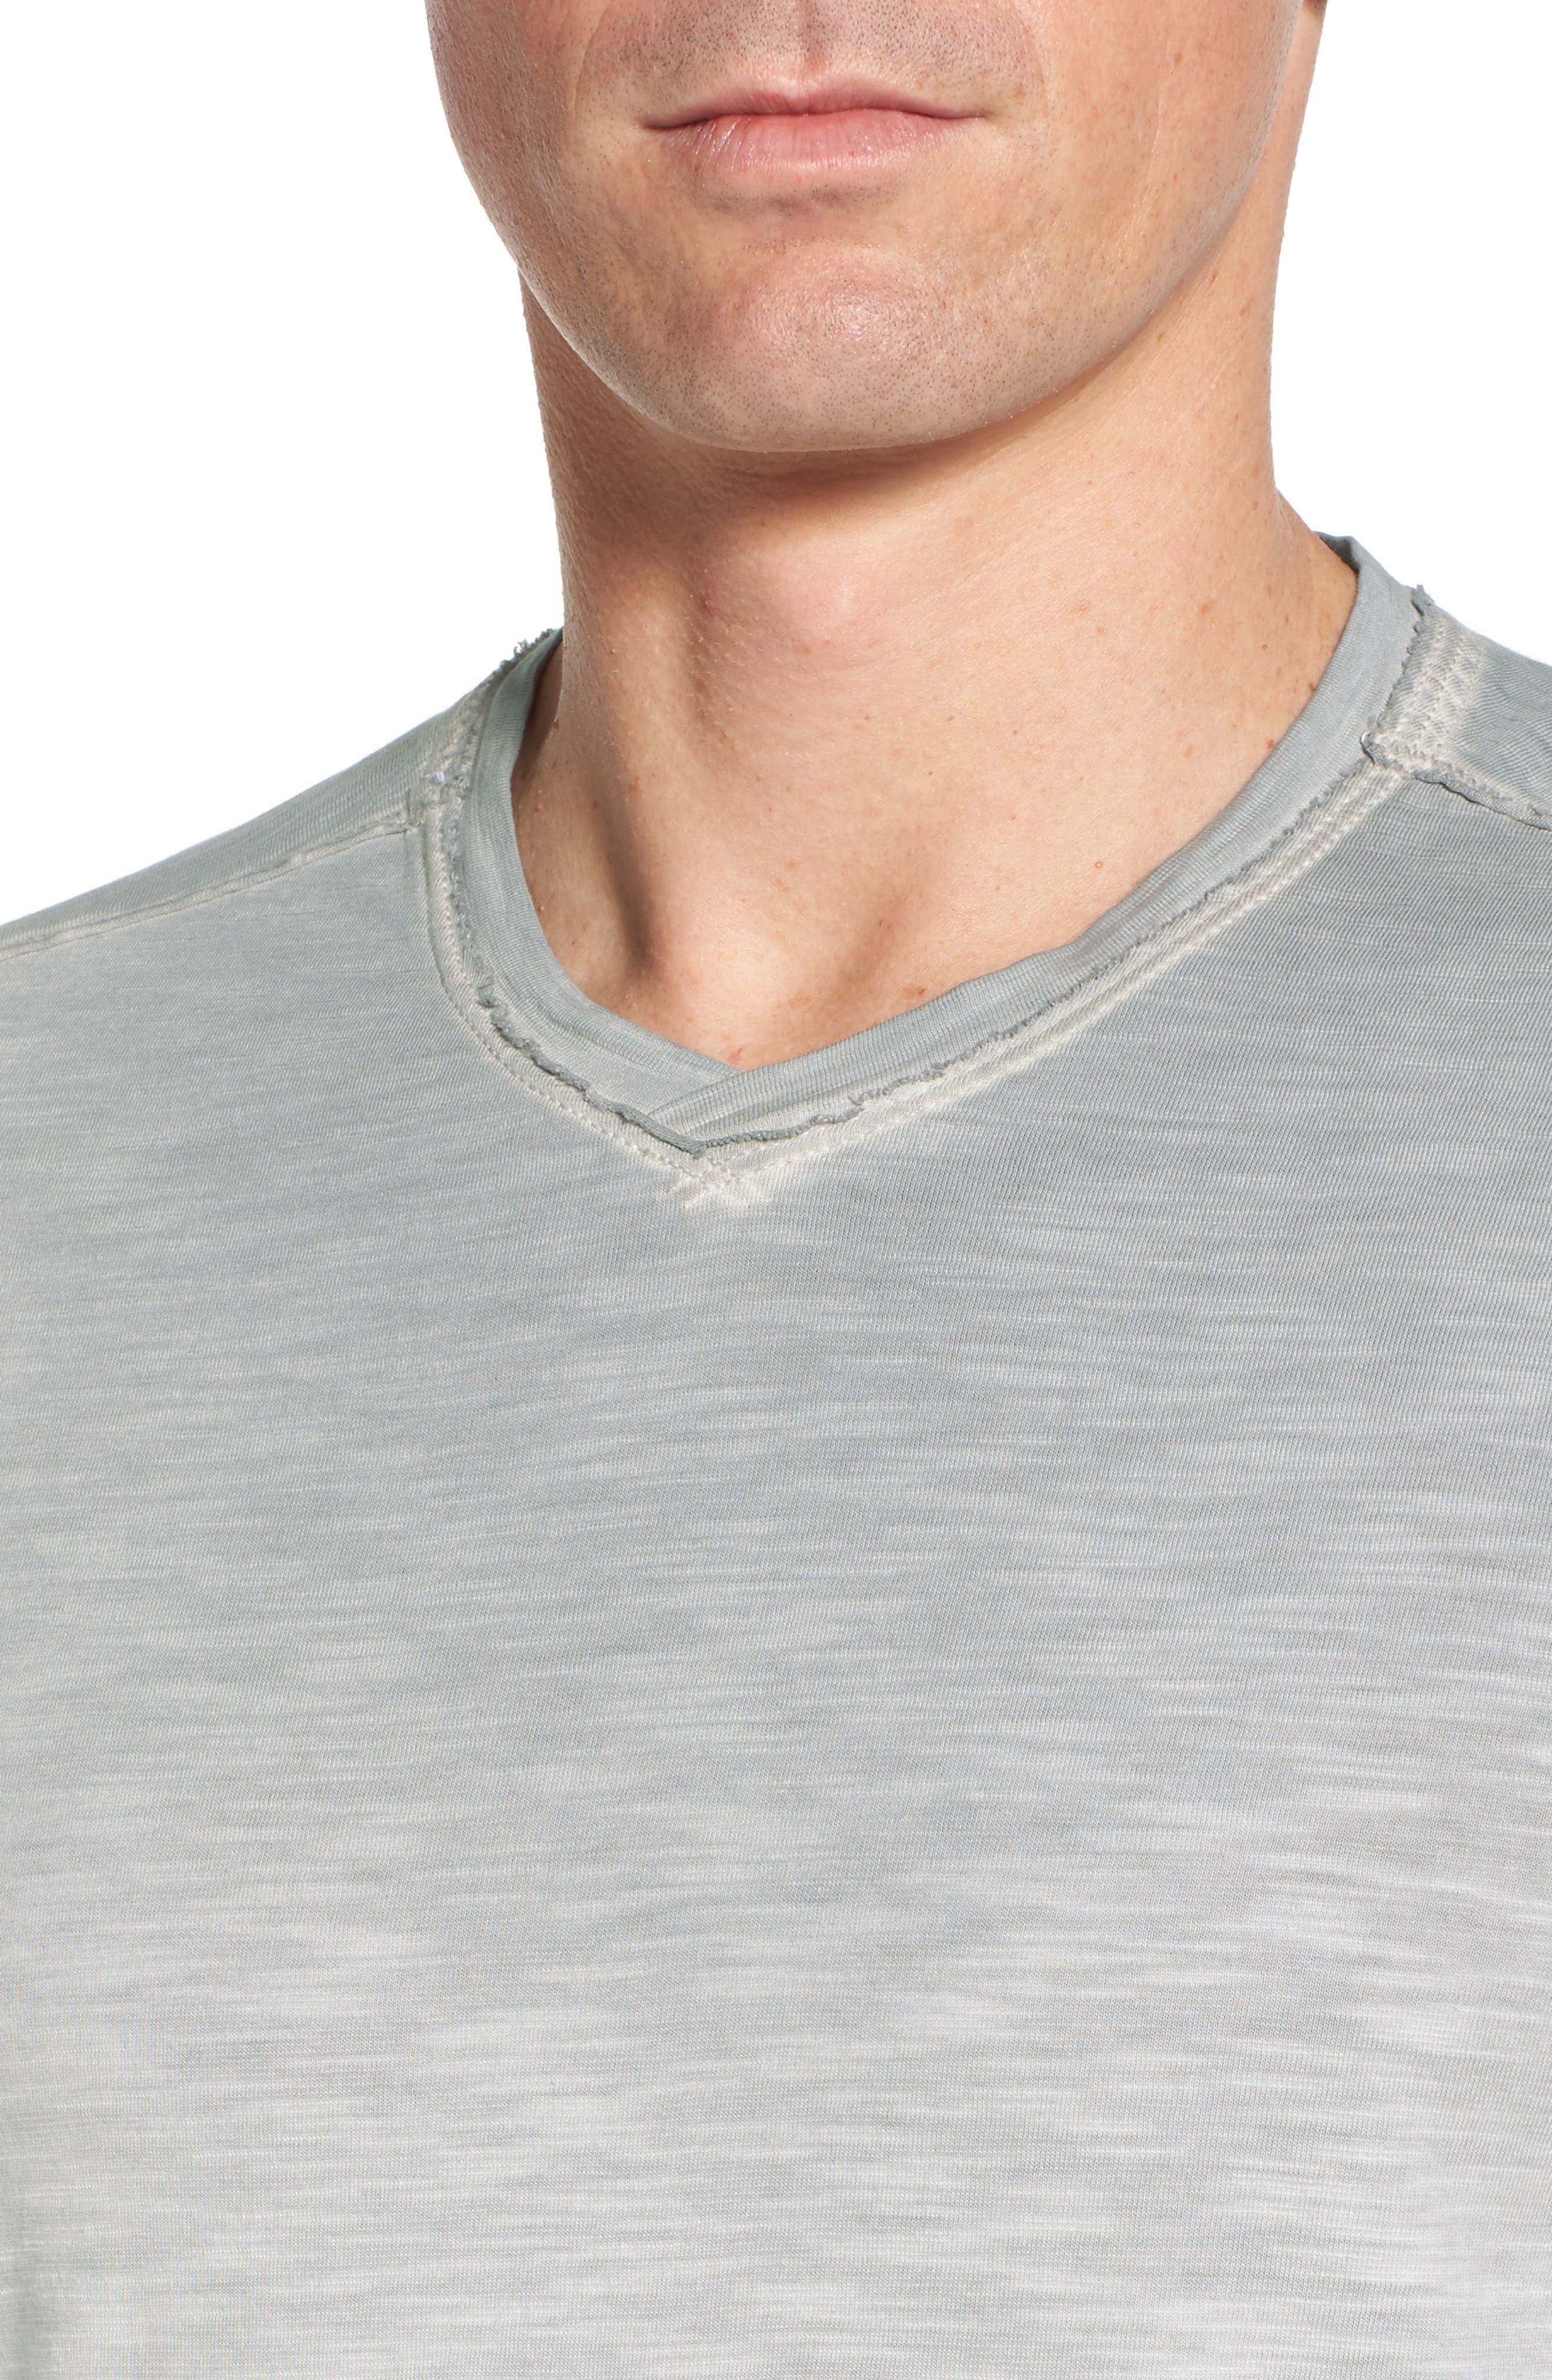 Suncoast Shores V-Neck T-Shirt,                             Alternate thumbnail 4, color,                             Bala Shark